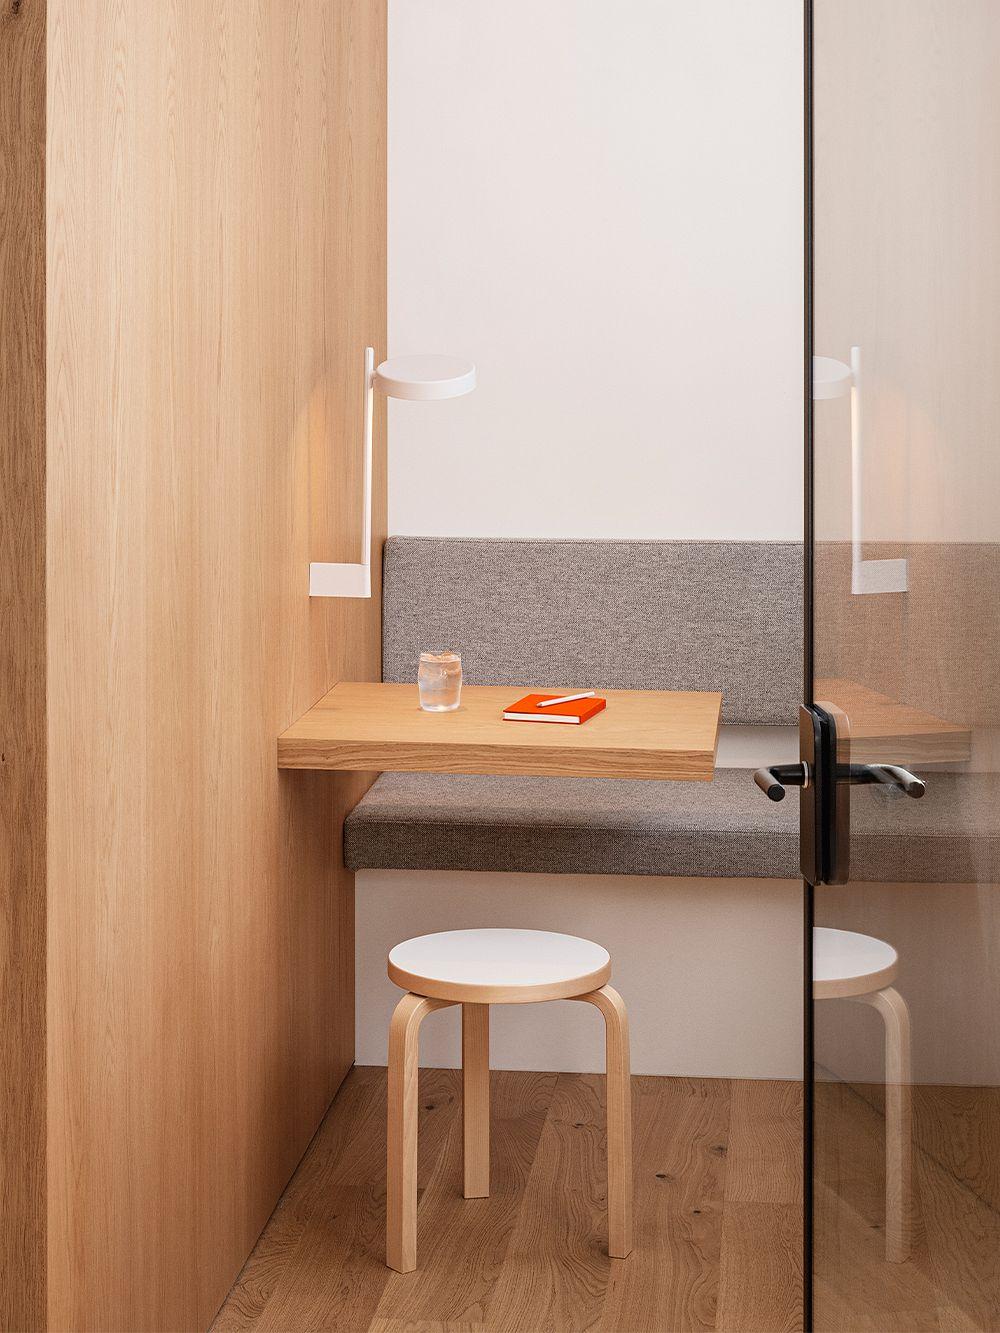 Artek Aalto stool 60, white laminate